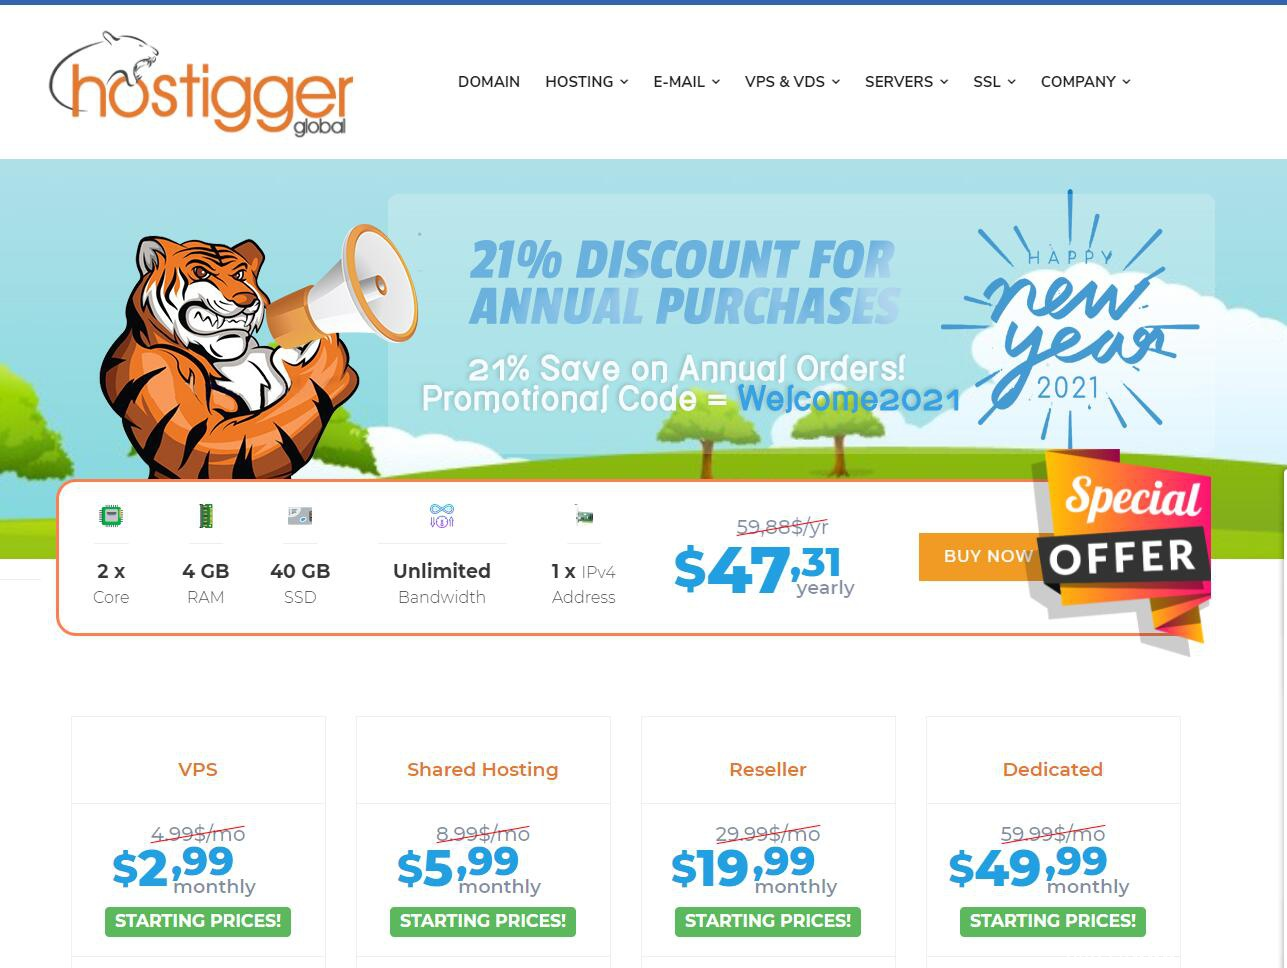 Hostigger新年促销:美国/荷兰/土耳其VPS全场79折,$28.33/年起,支持支付宝插图